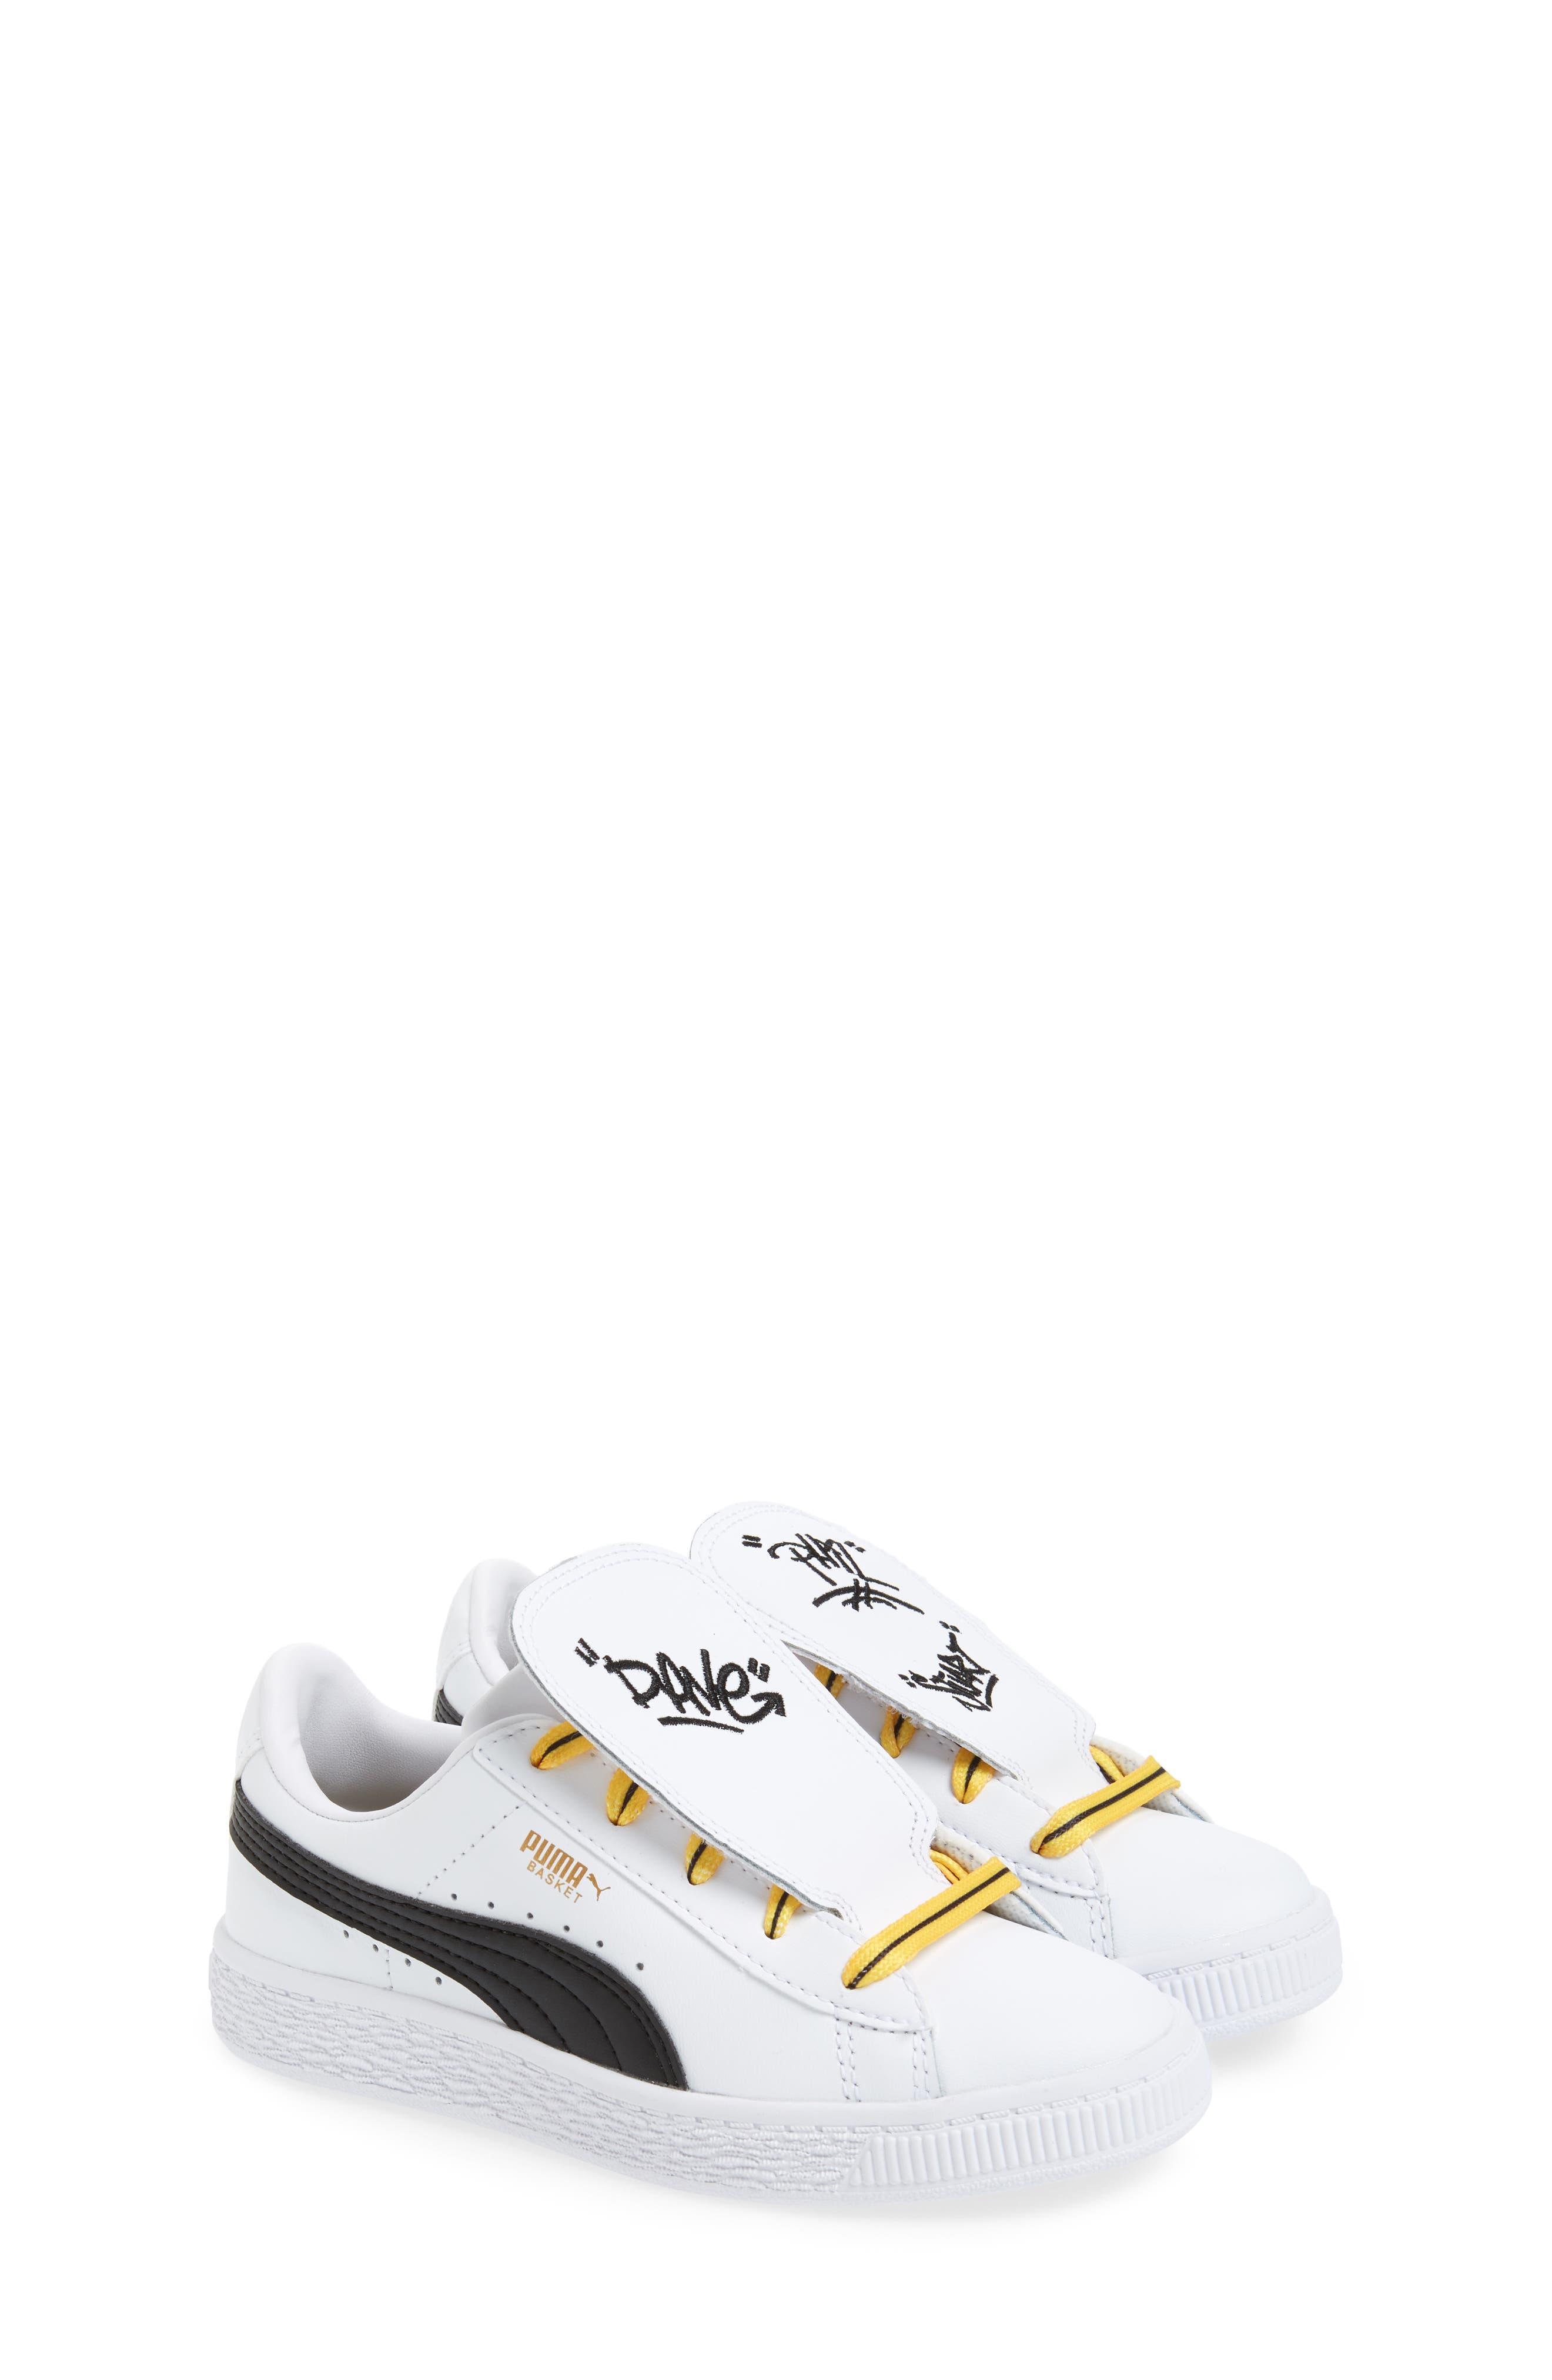 x Minions Basket Embroidered Tongue Sneaker,                             Alternate thumbnail 3, color,                             White/ Black/ Minion Yellow